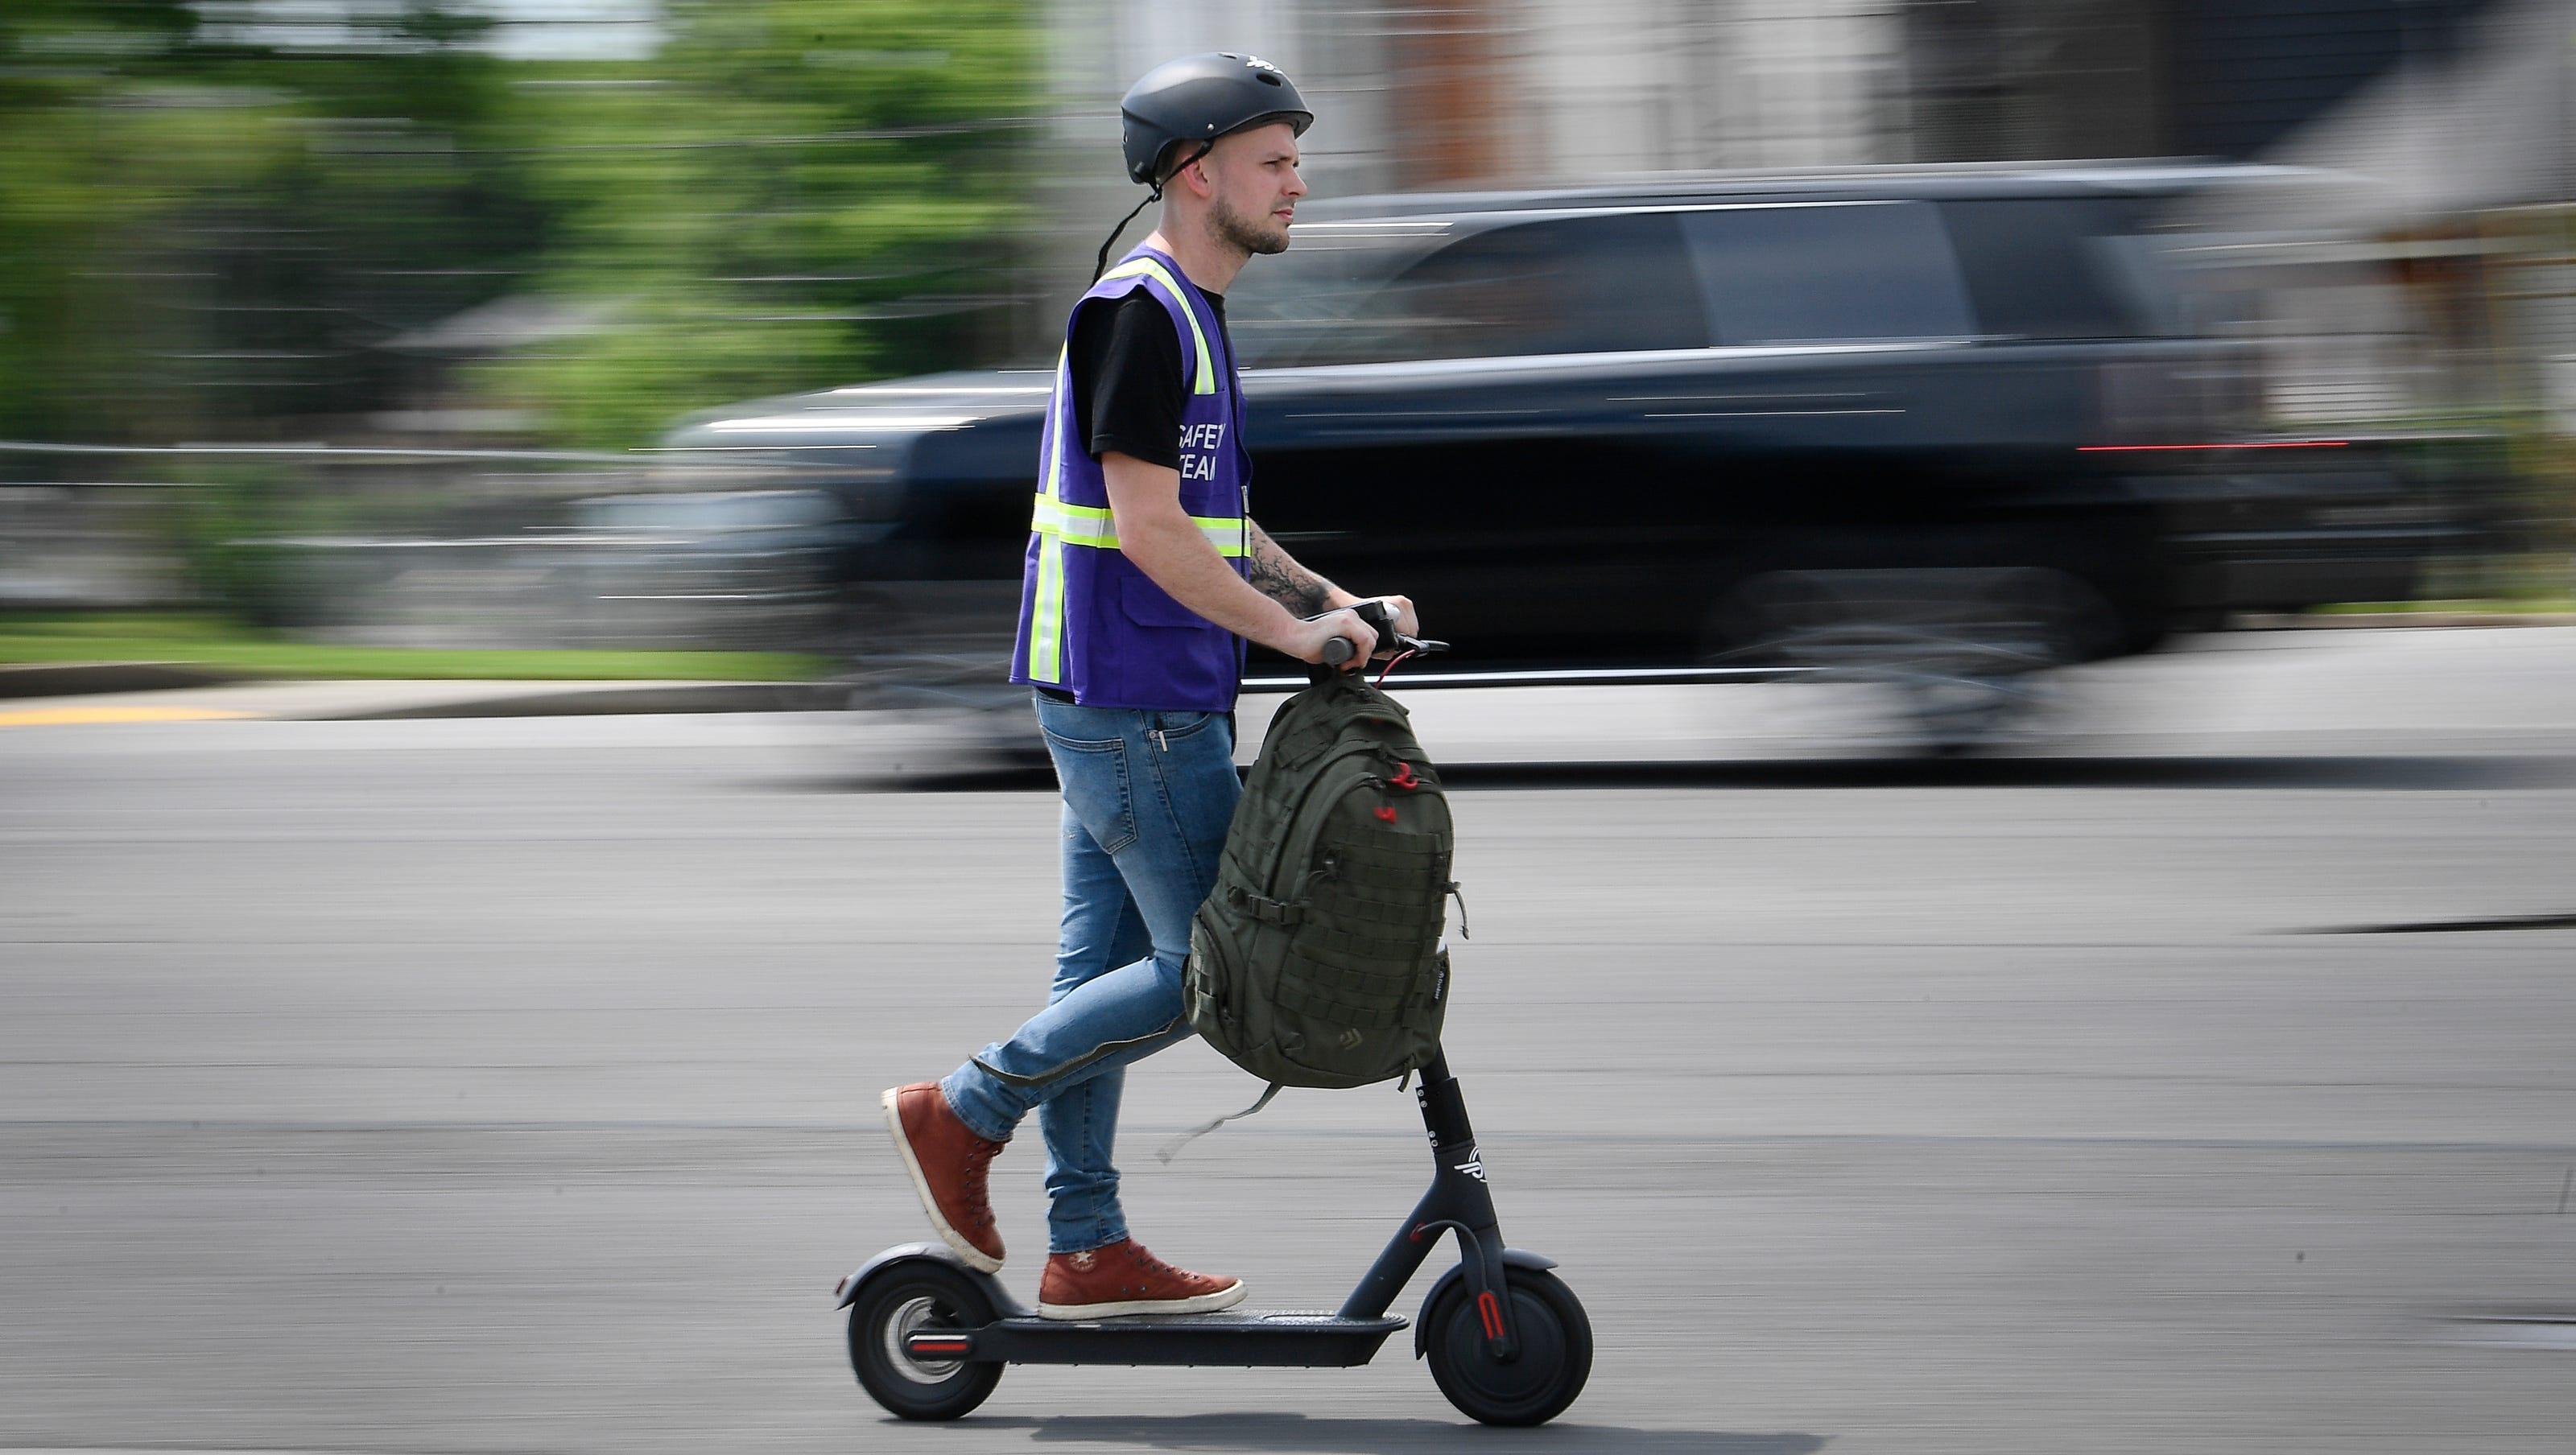 Bird Electric Scooter Rental Nashville Problems Harm Company Reputation